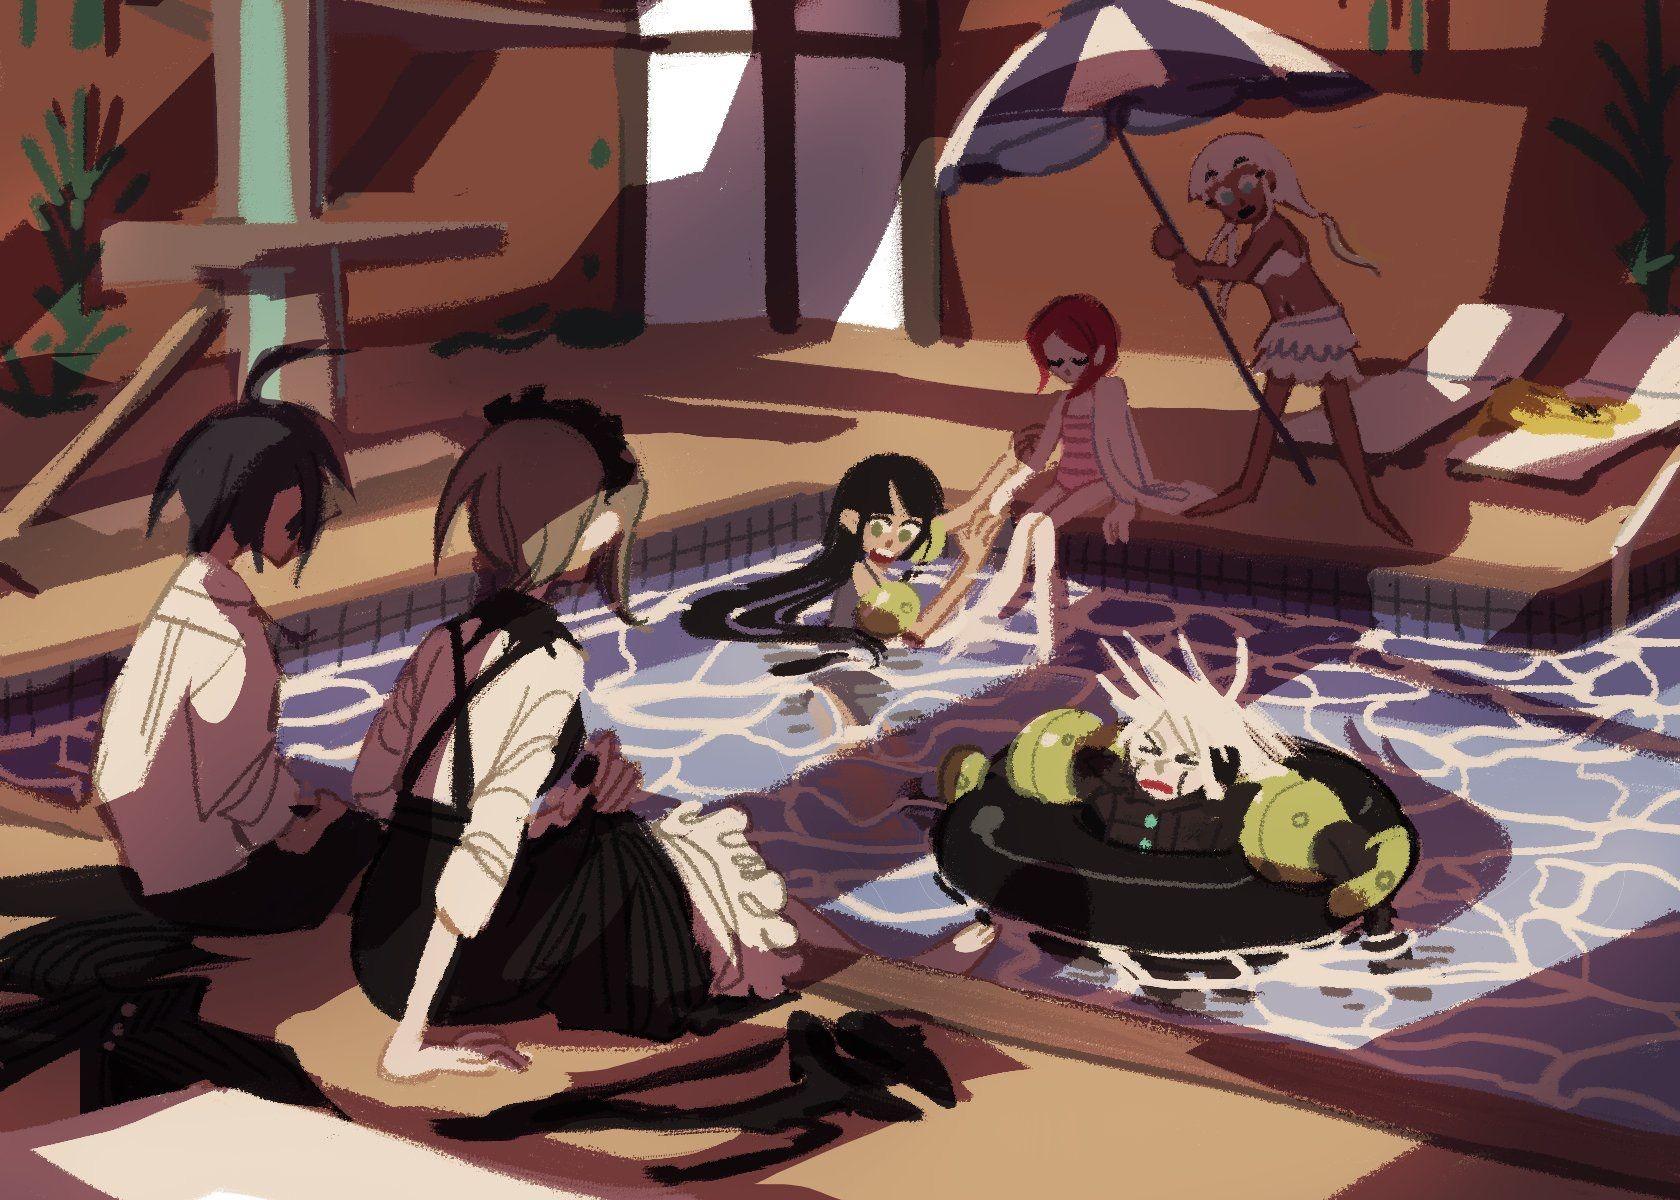 Pin By Roni On Anime Games Danganronpa Danganronpa Memes New